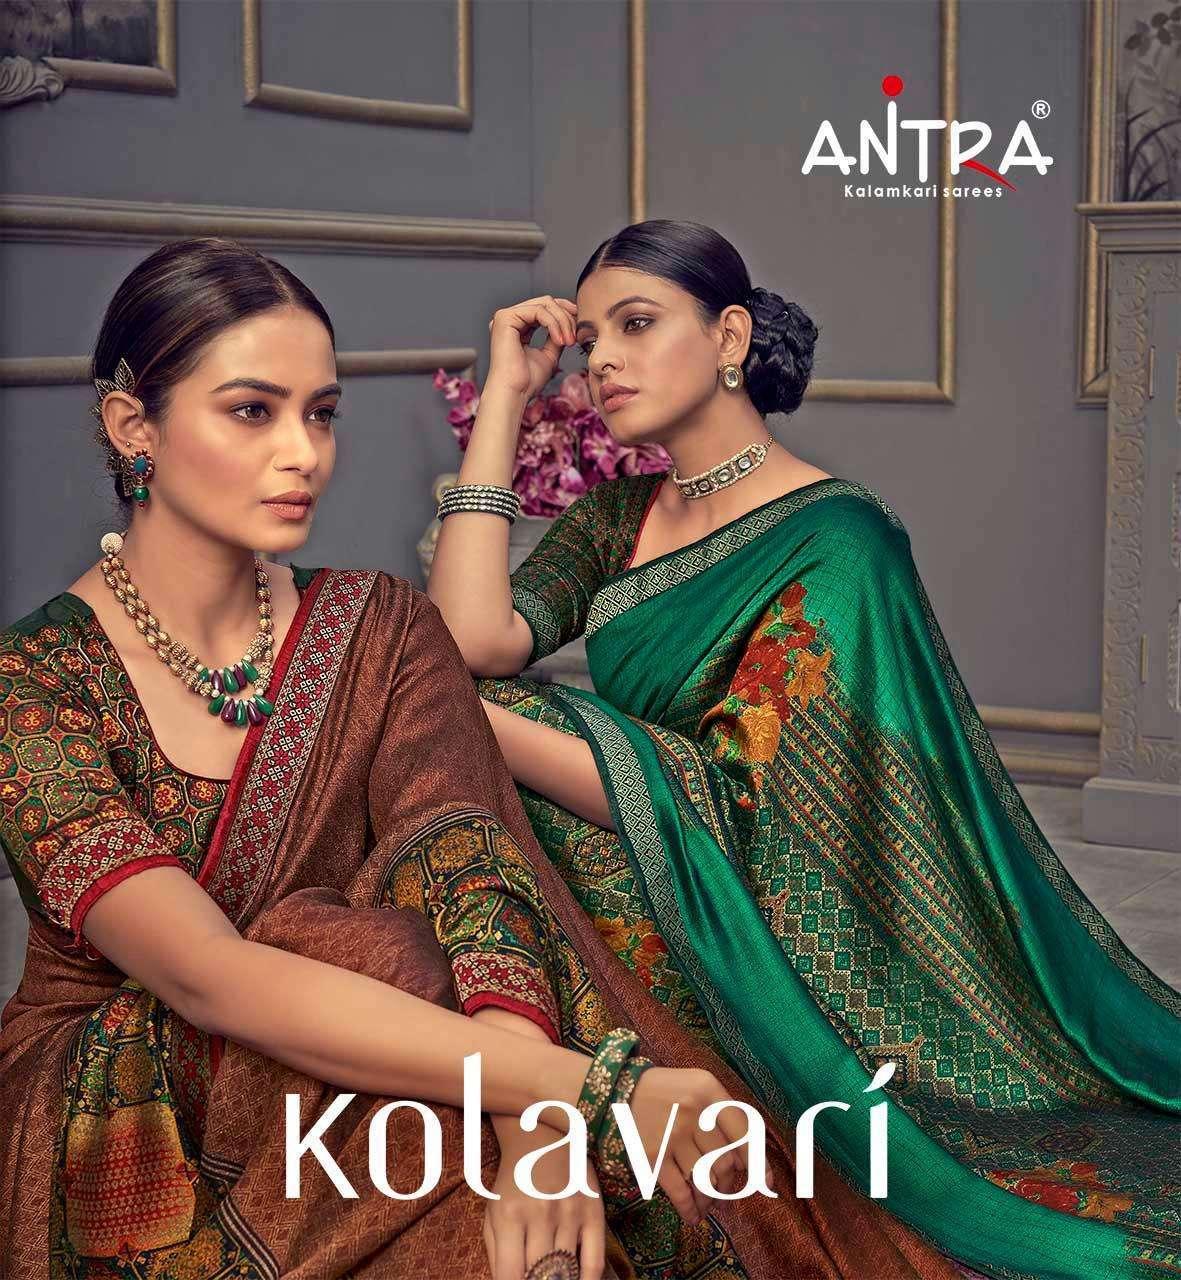 Antra Kolavari Vichitara Silk Printed Sarees collection